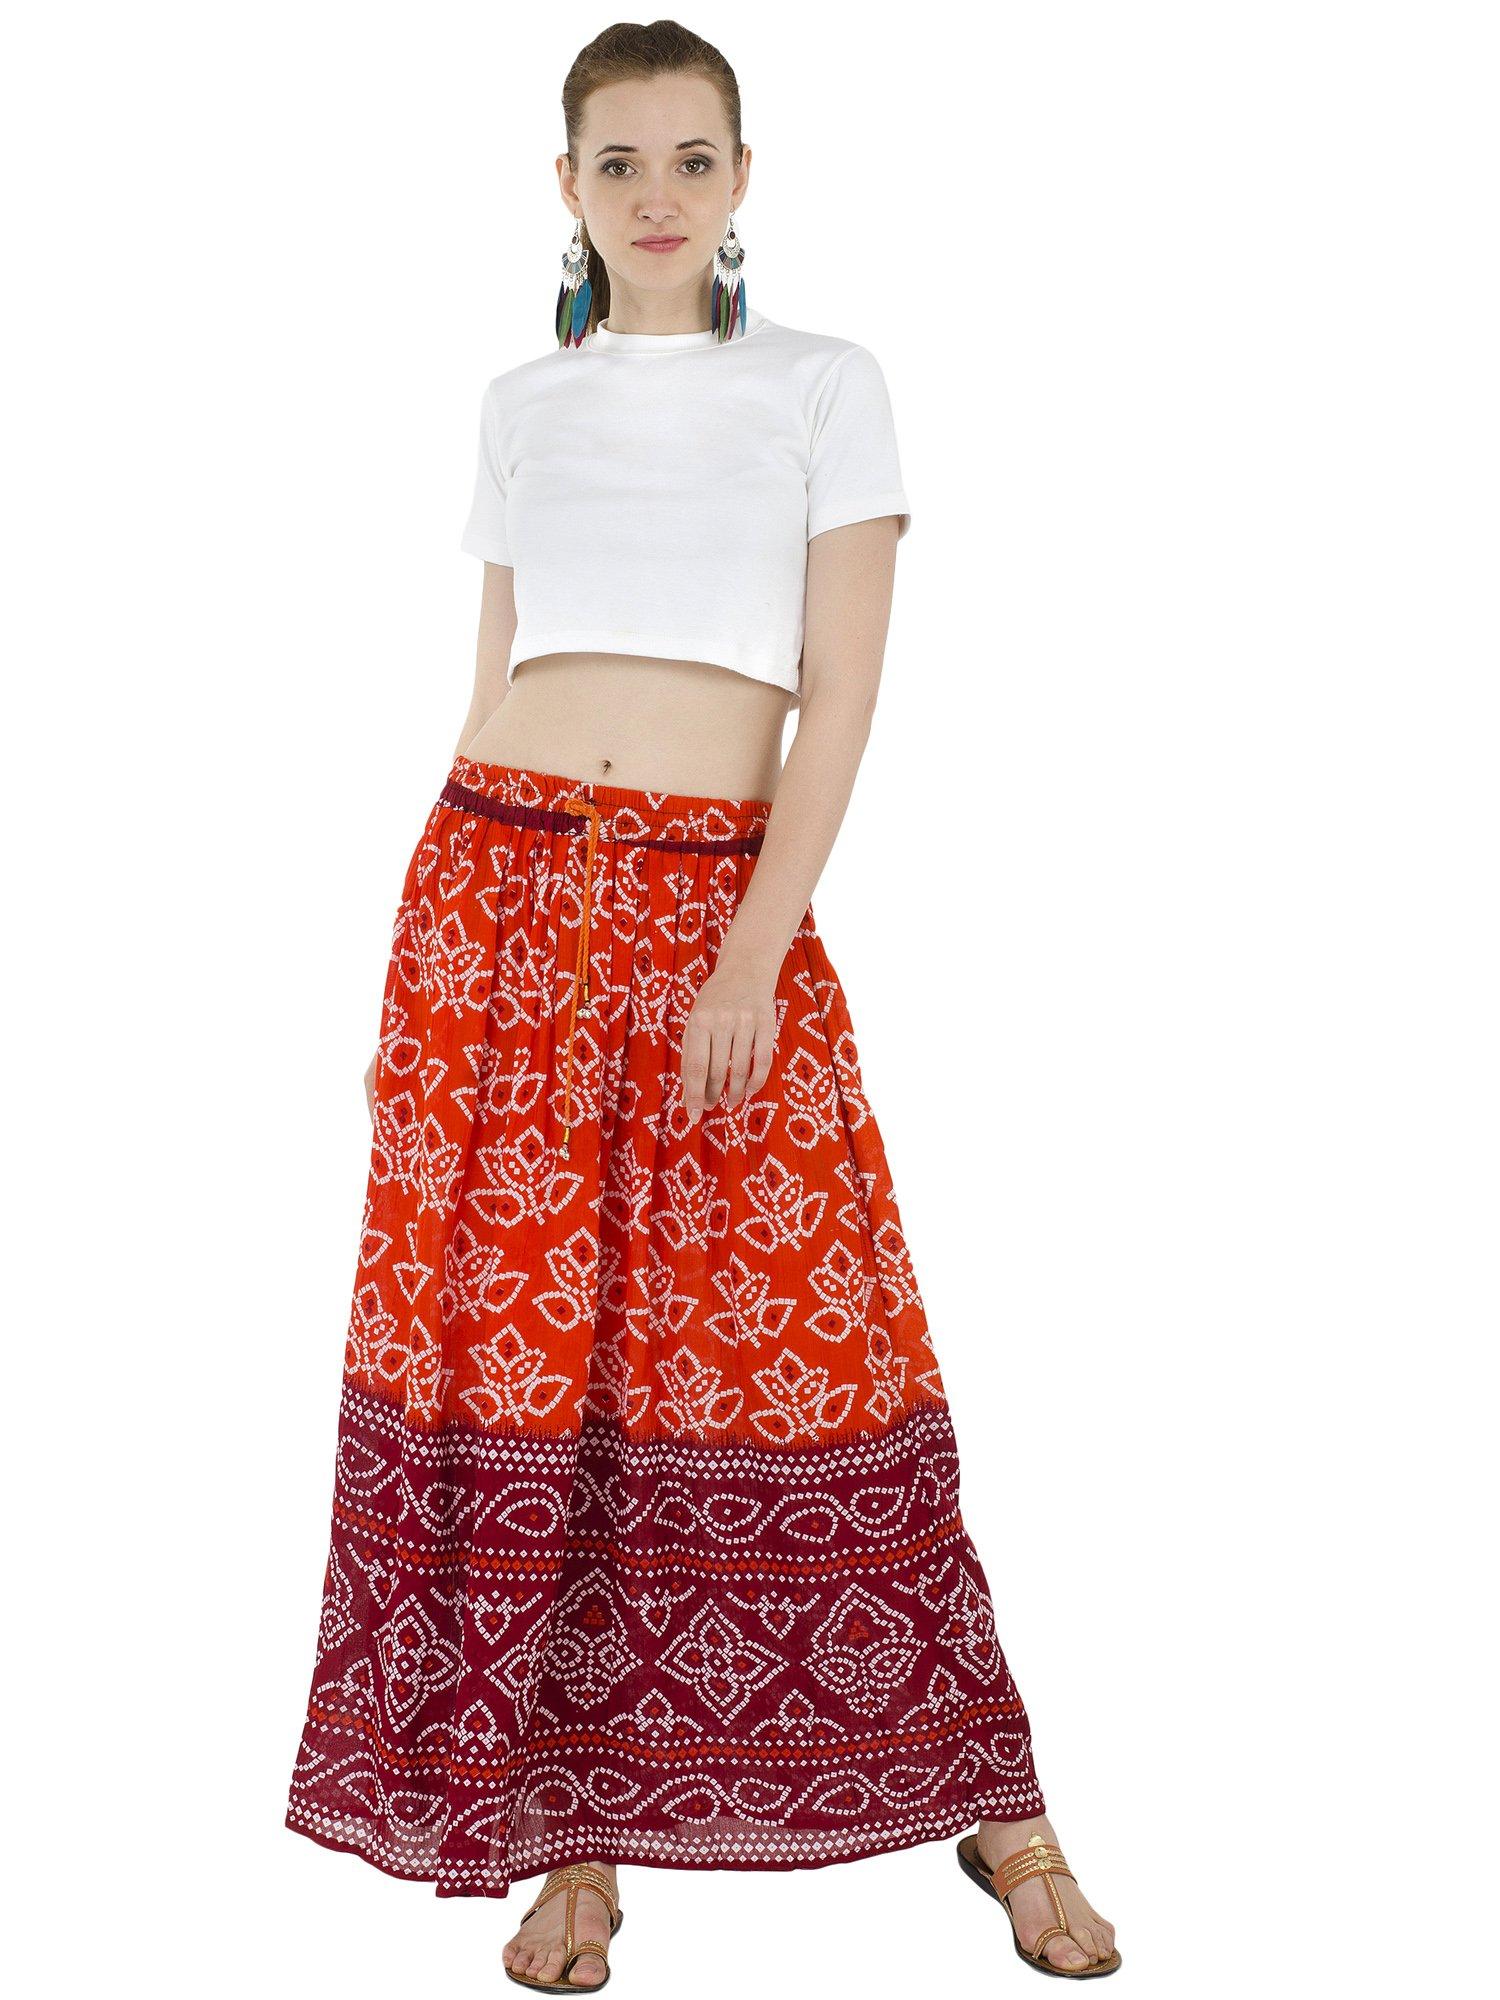 Women's Elegant Summer Full Length Floral Print Pleated Cotton Long Maxi Skirt Dress